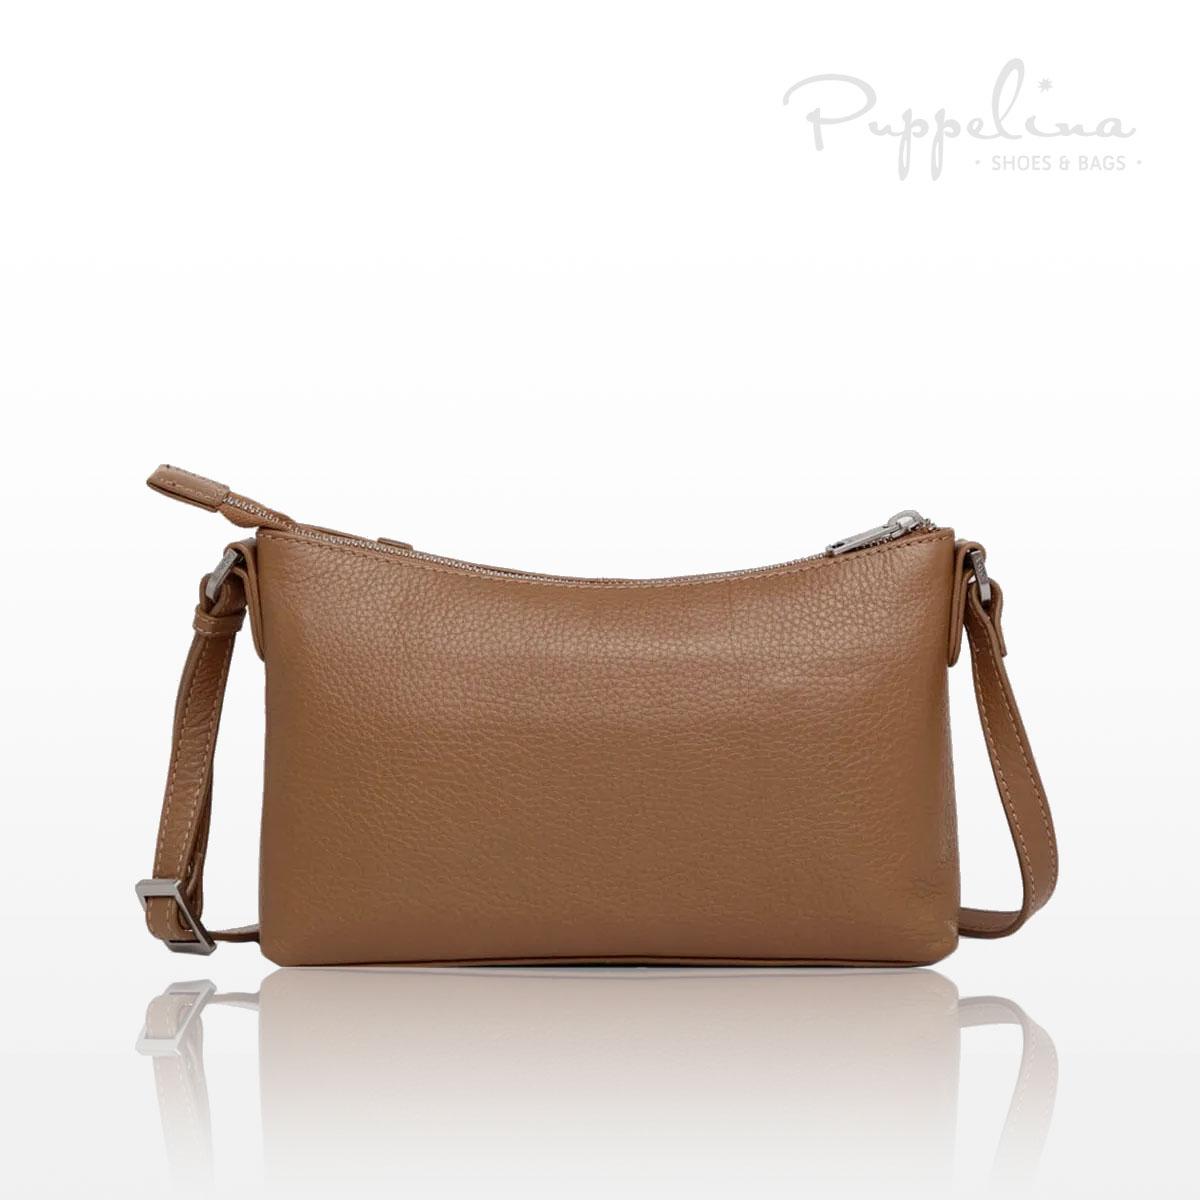 Puppelina-acc-P1083